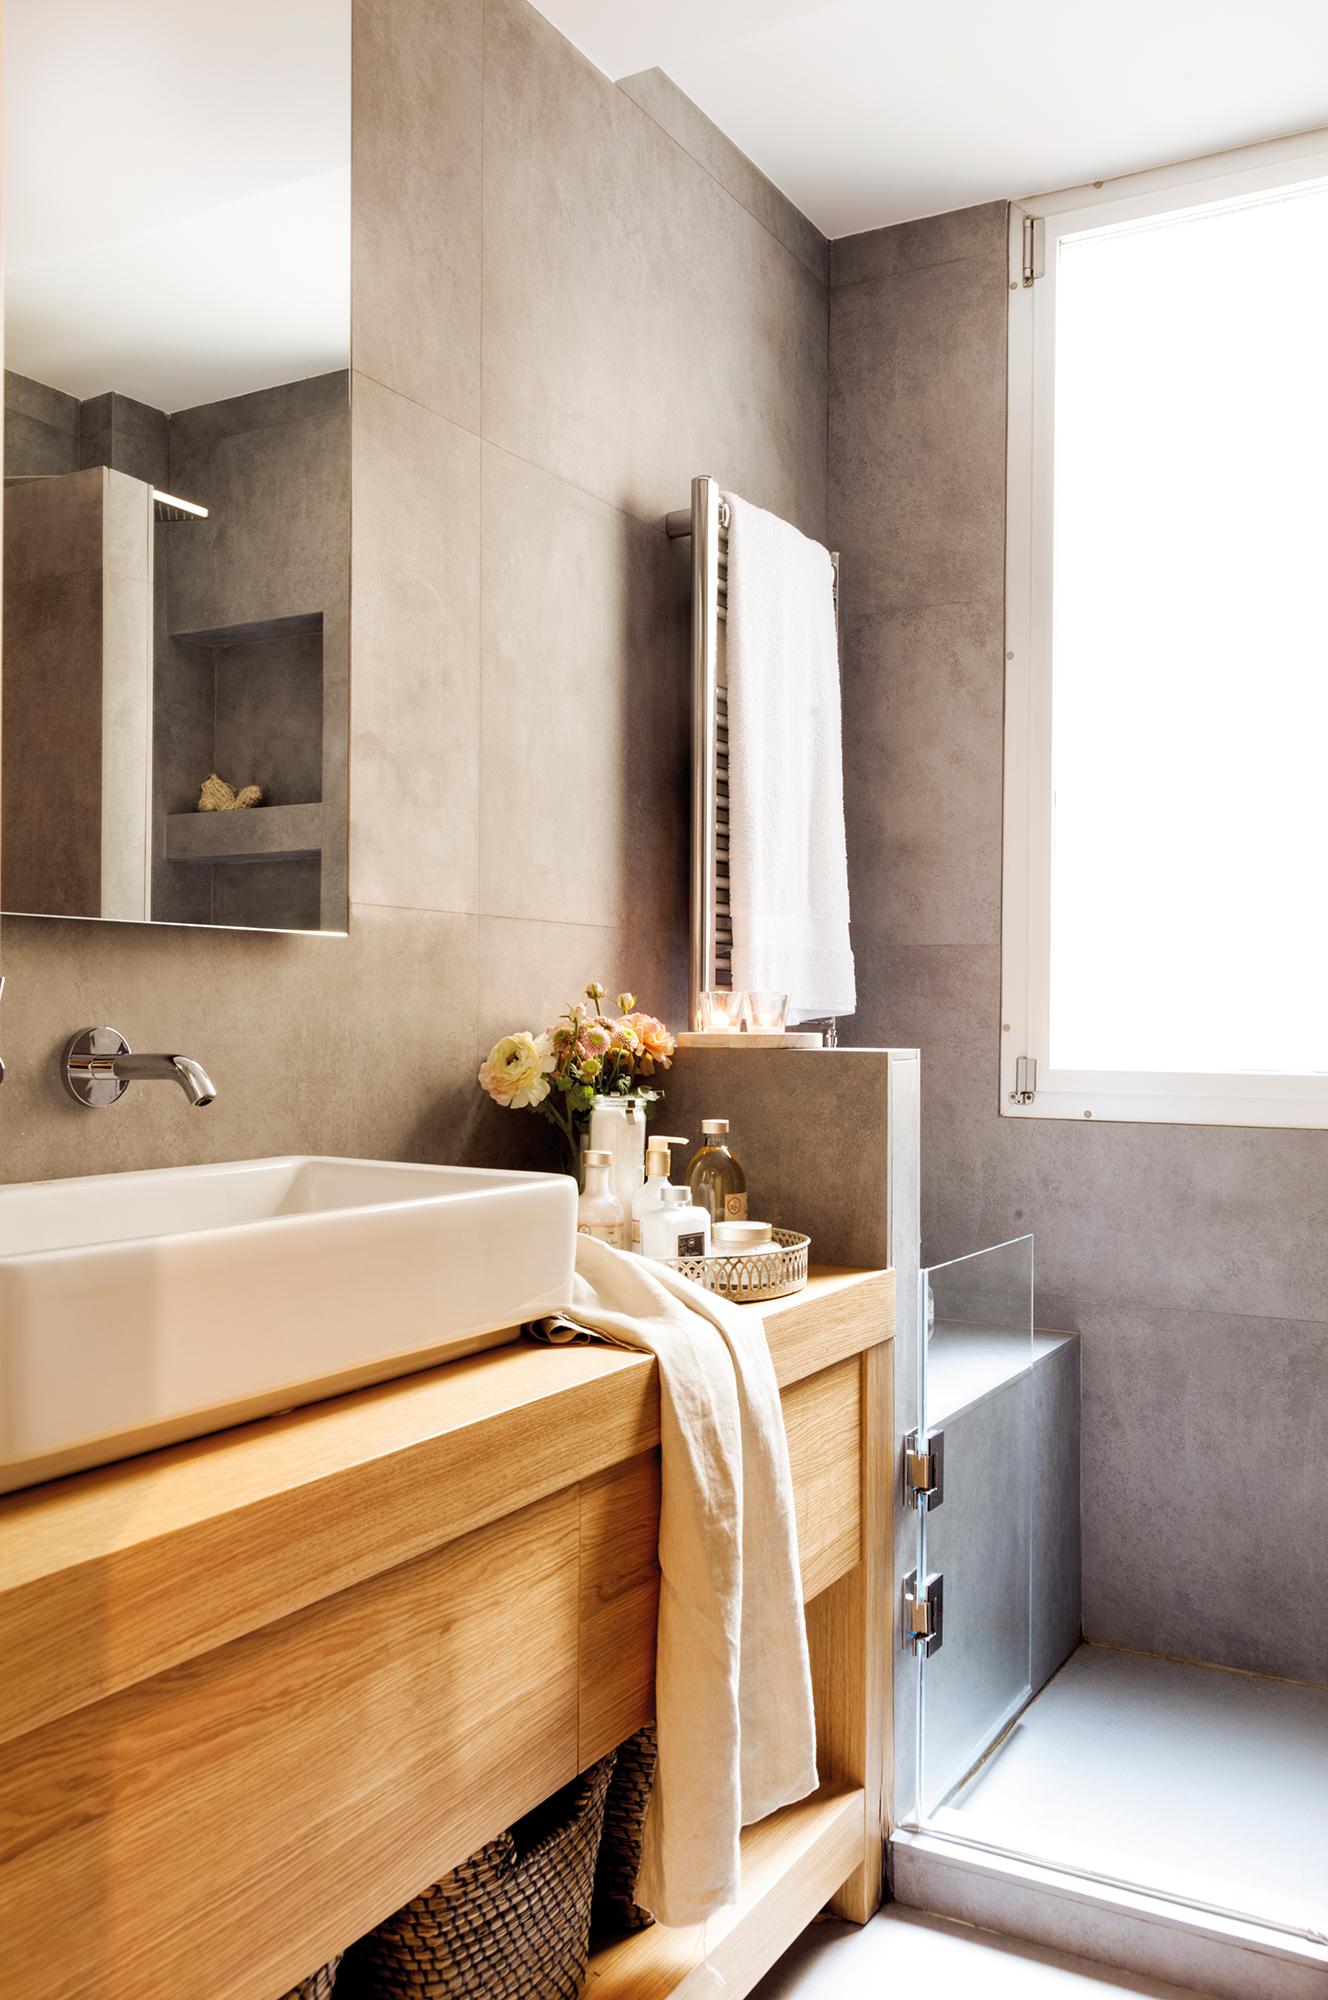 Muebles ba o decoraci n accesorios mamparas y azulejos for Toalleros para bano modernos